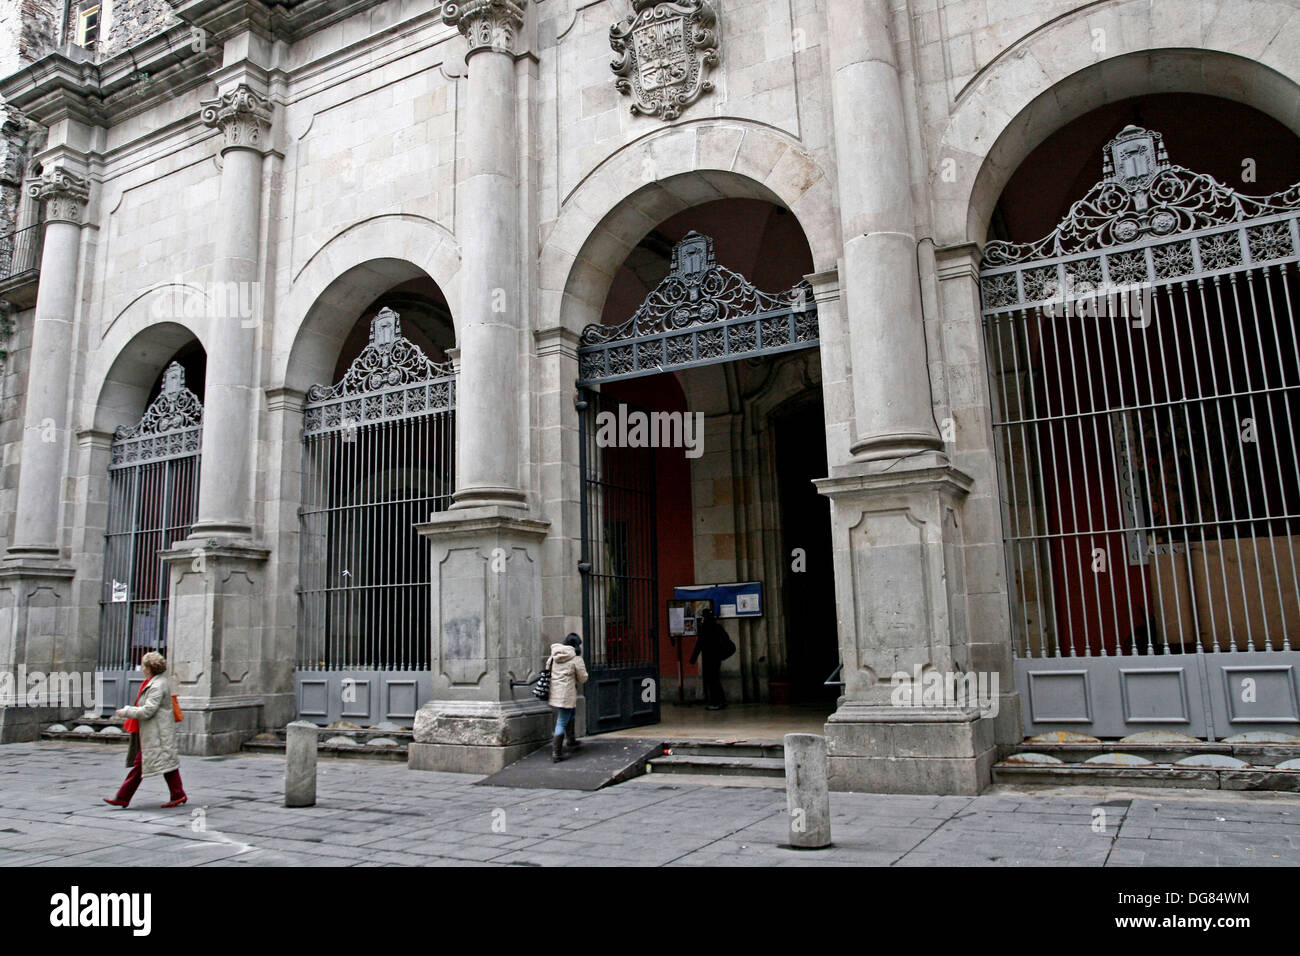 Church of Sant Agusti, Baroque, arq Pere Bertran, Barcelona, Catalonia, Spain - Stock Image